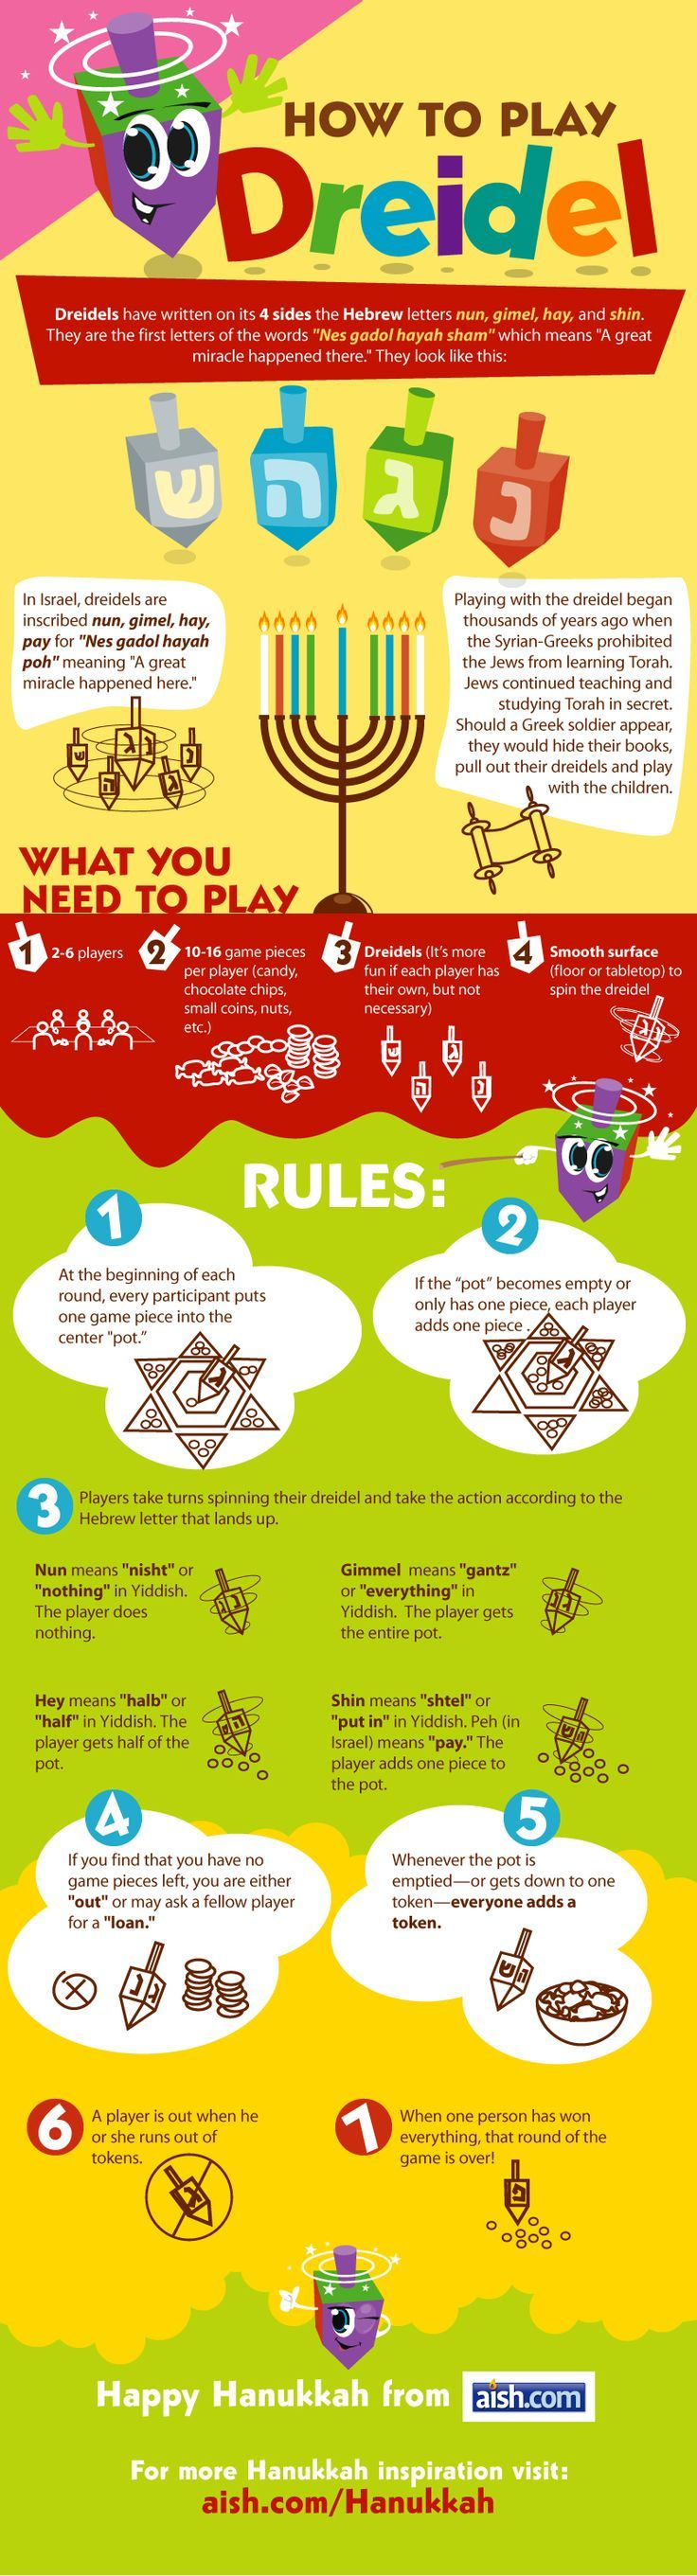 Dreidel 101 Share it with every Jewish kid :)